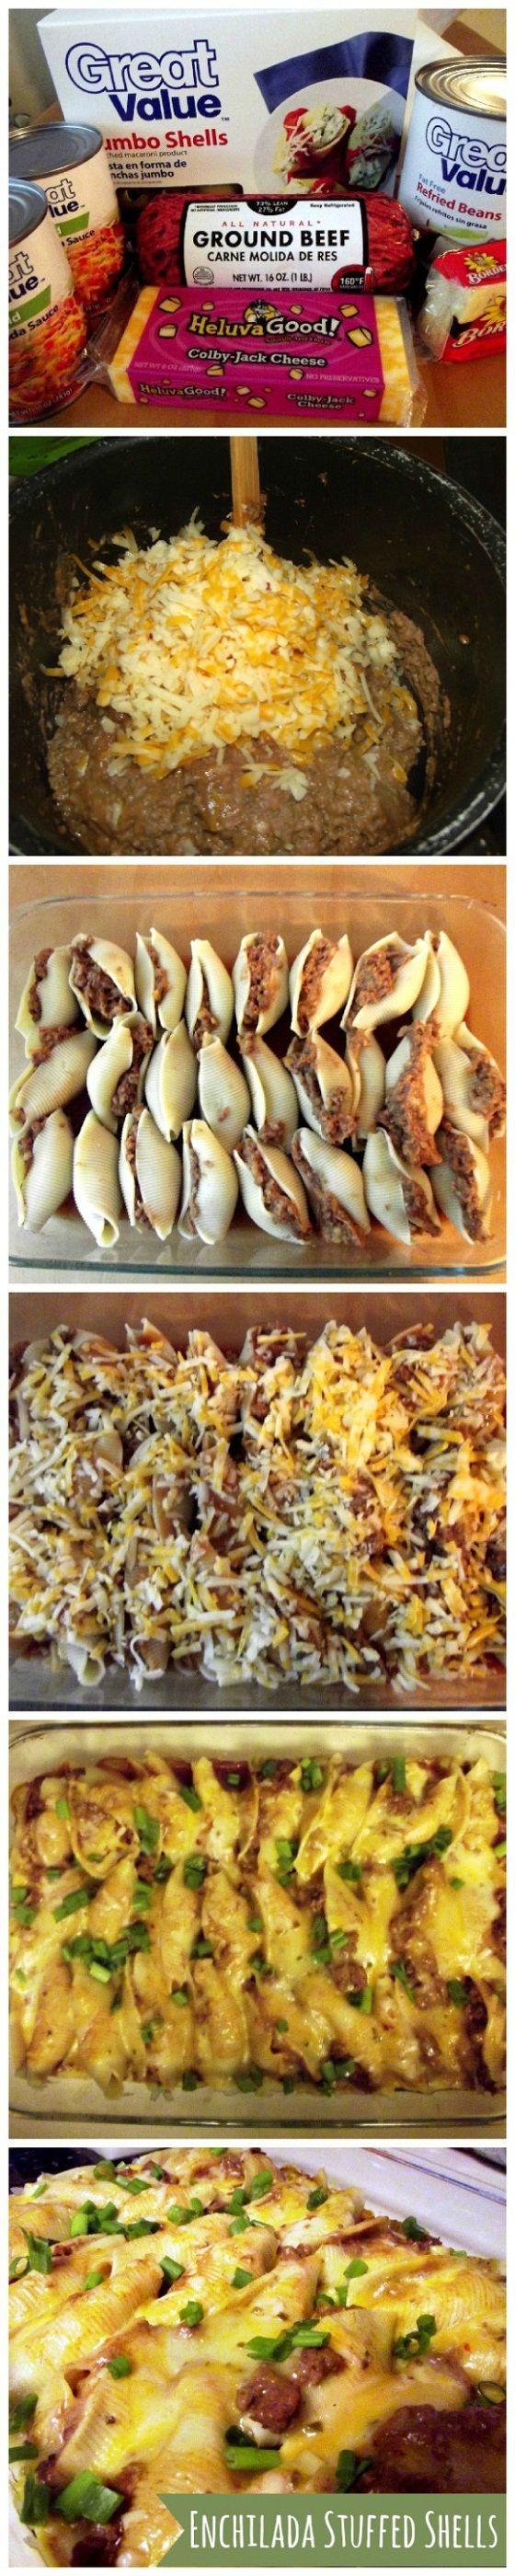 Enchilada Stuffed Shells